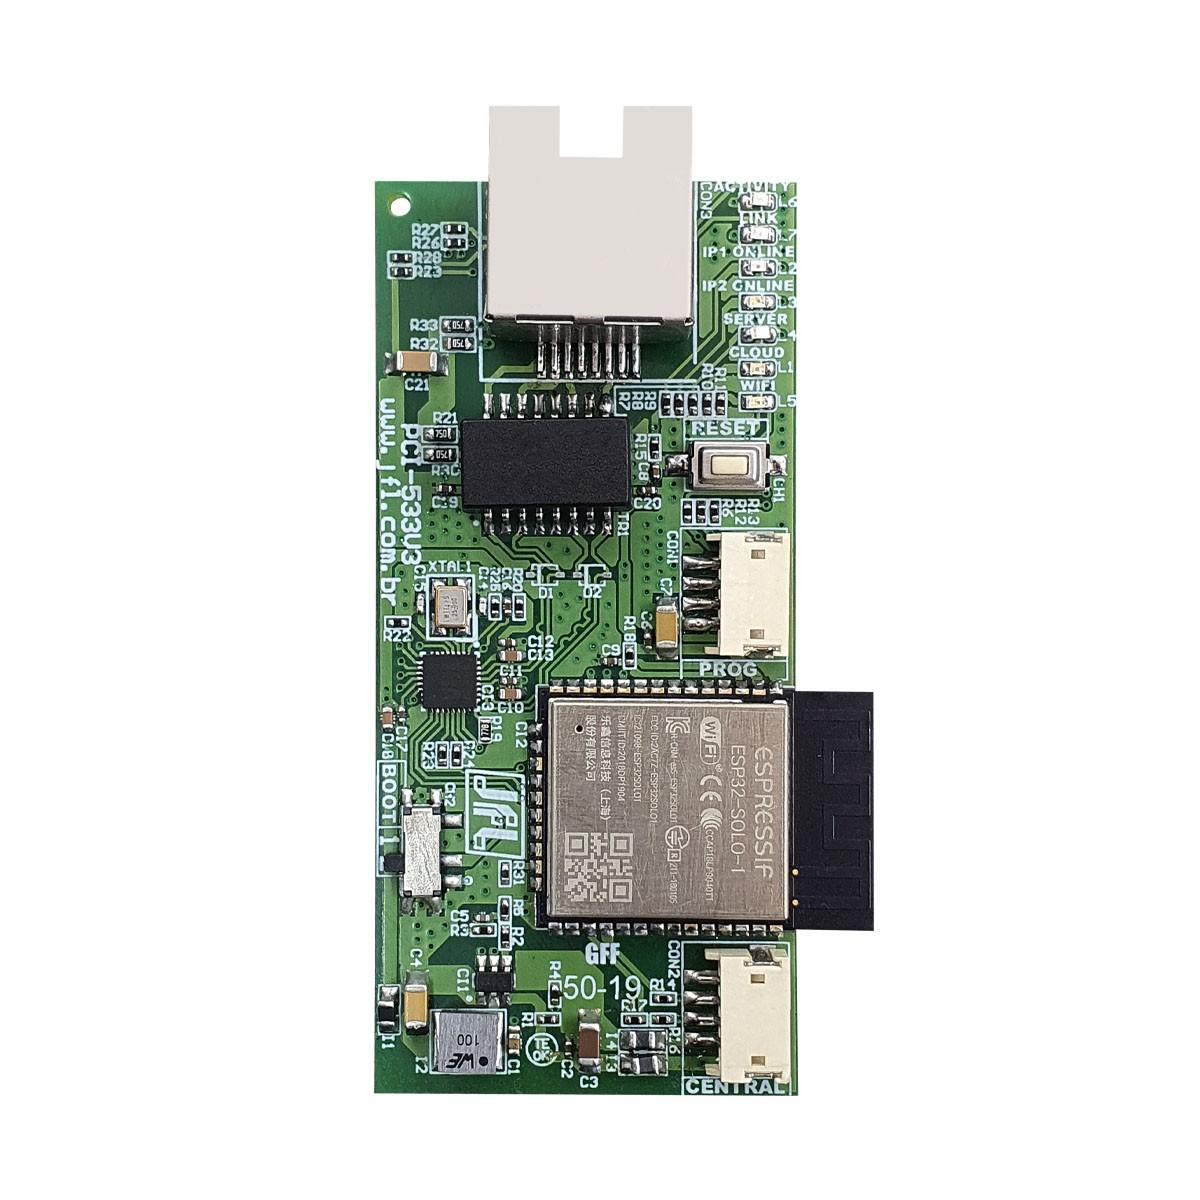 Kit Alarme SmartCloud 18 Jfl Com Sensores 510 Bus Jfl